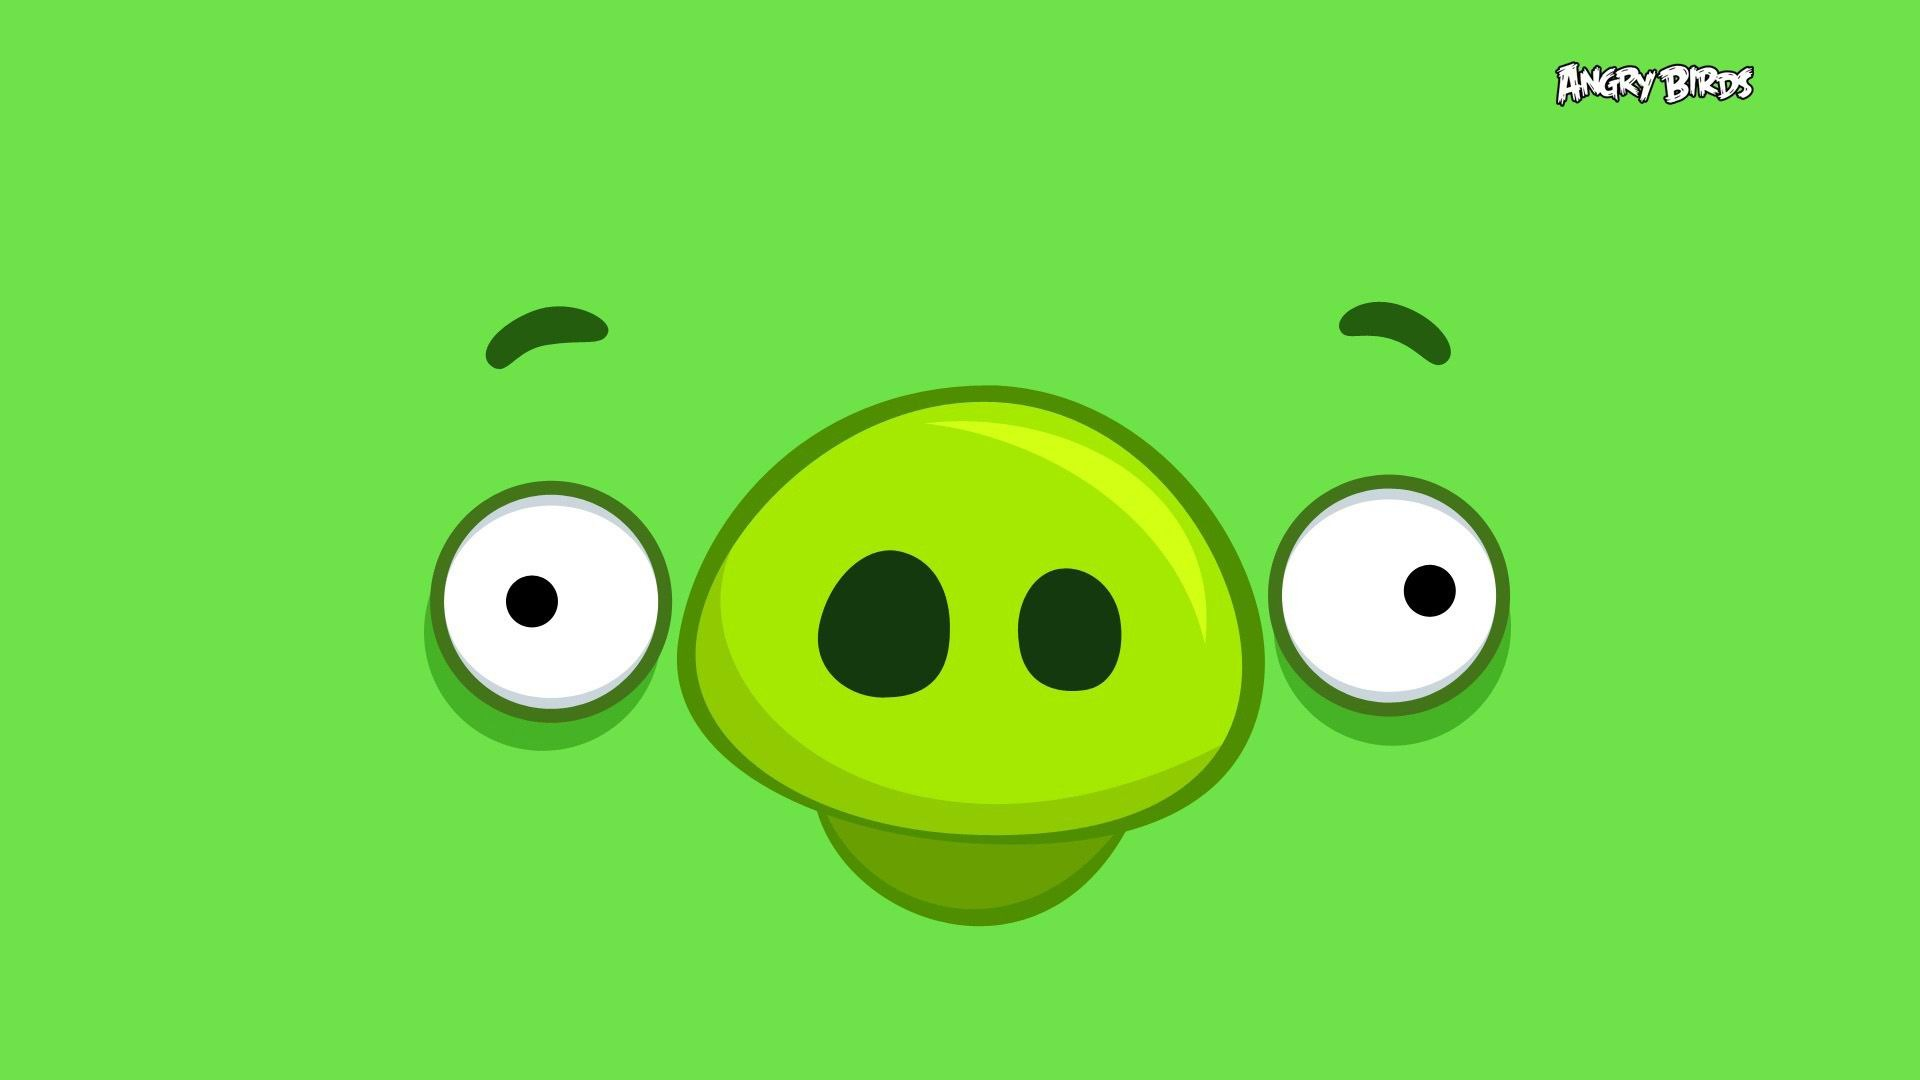 Angry Birds Wallpaper Hd wallpaper   1137793 1920x1080